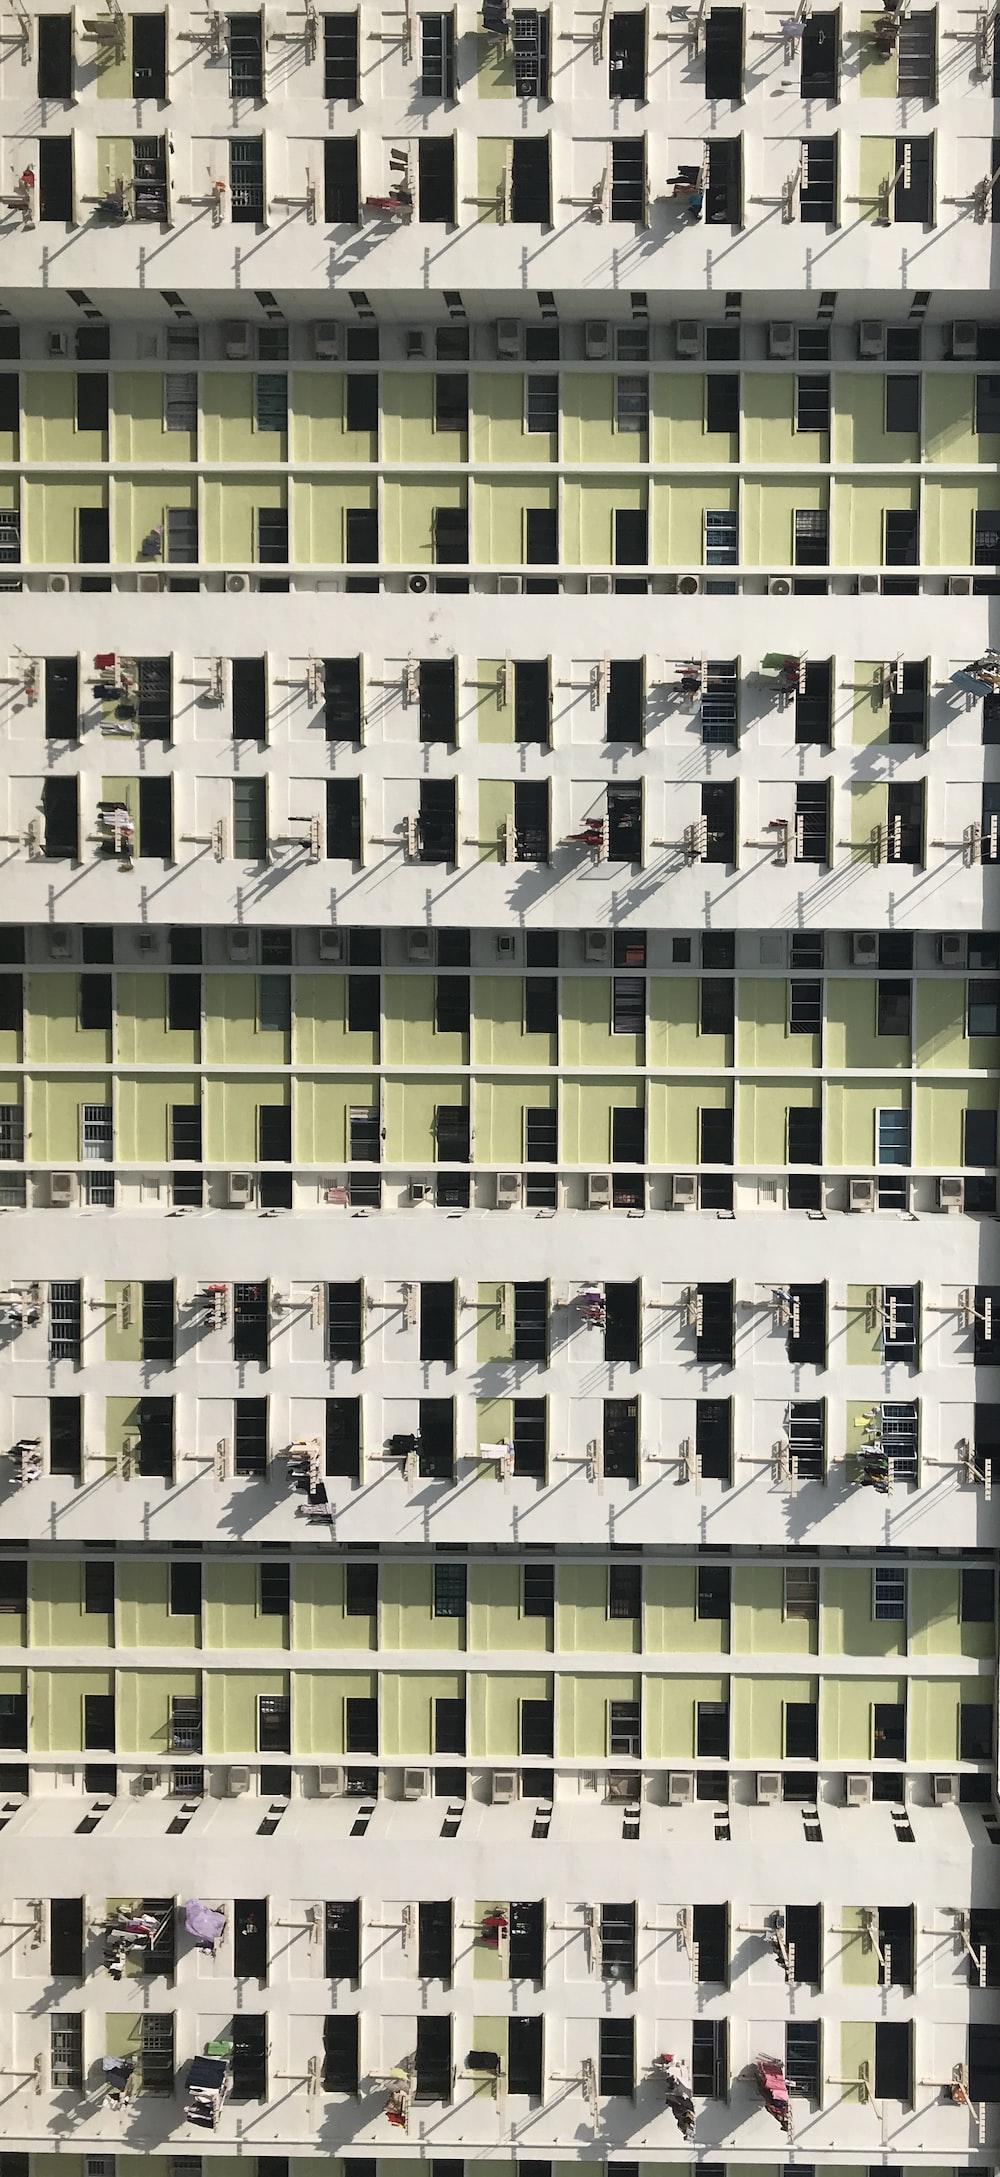 minimalist photography of high-rise building window